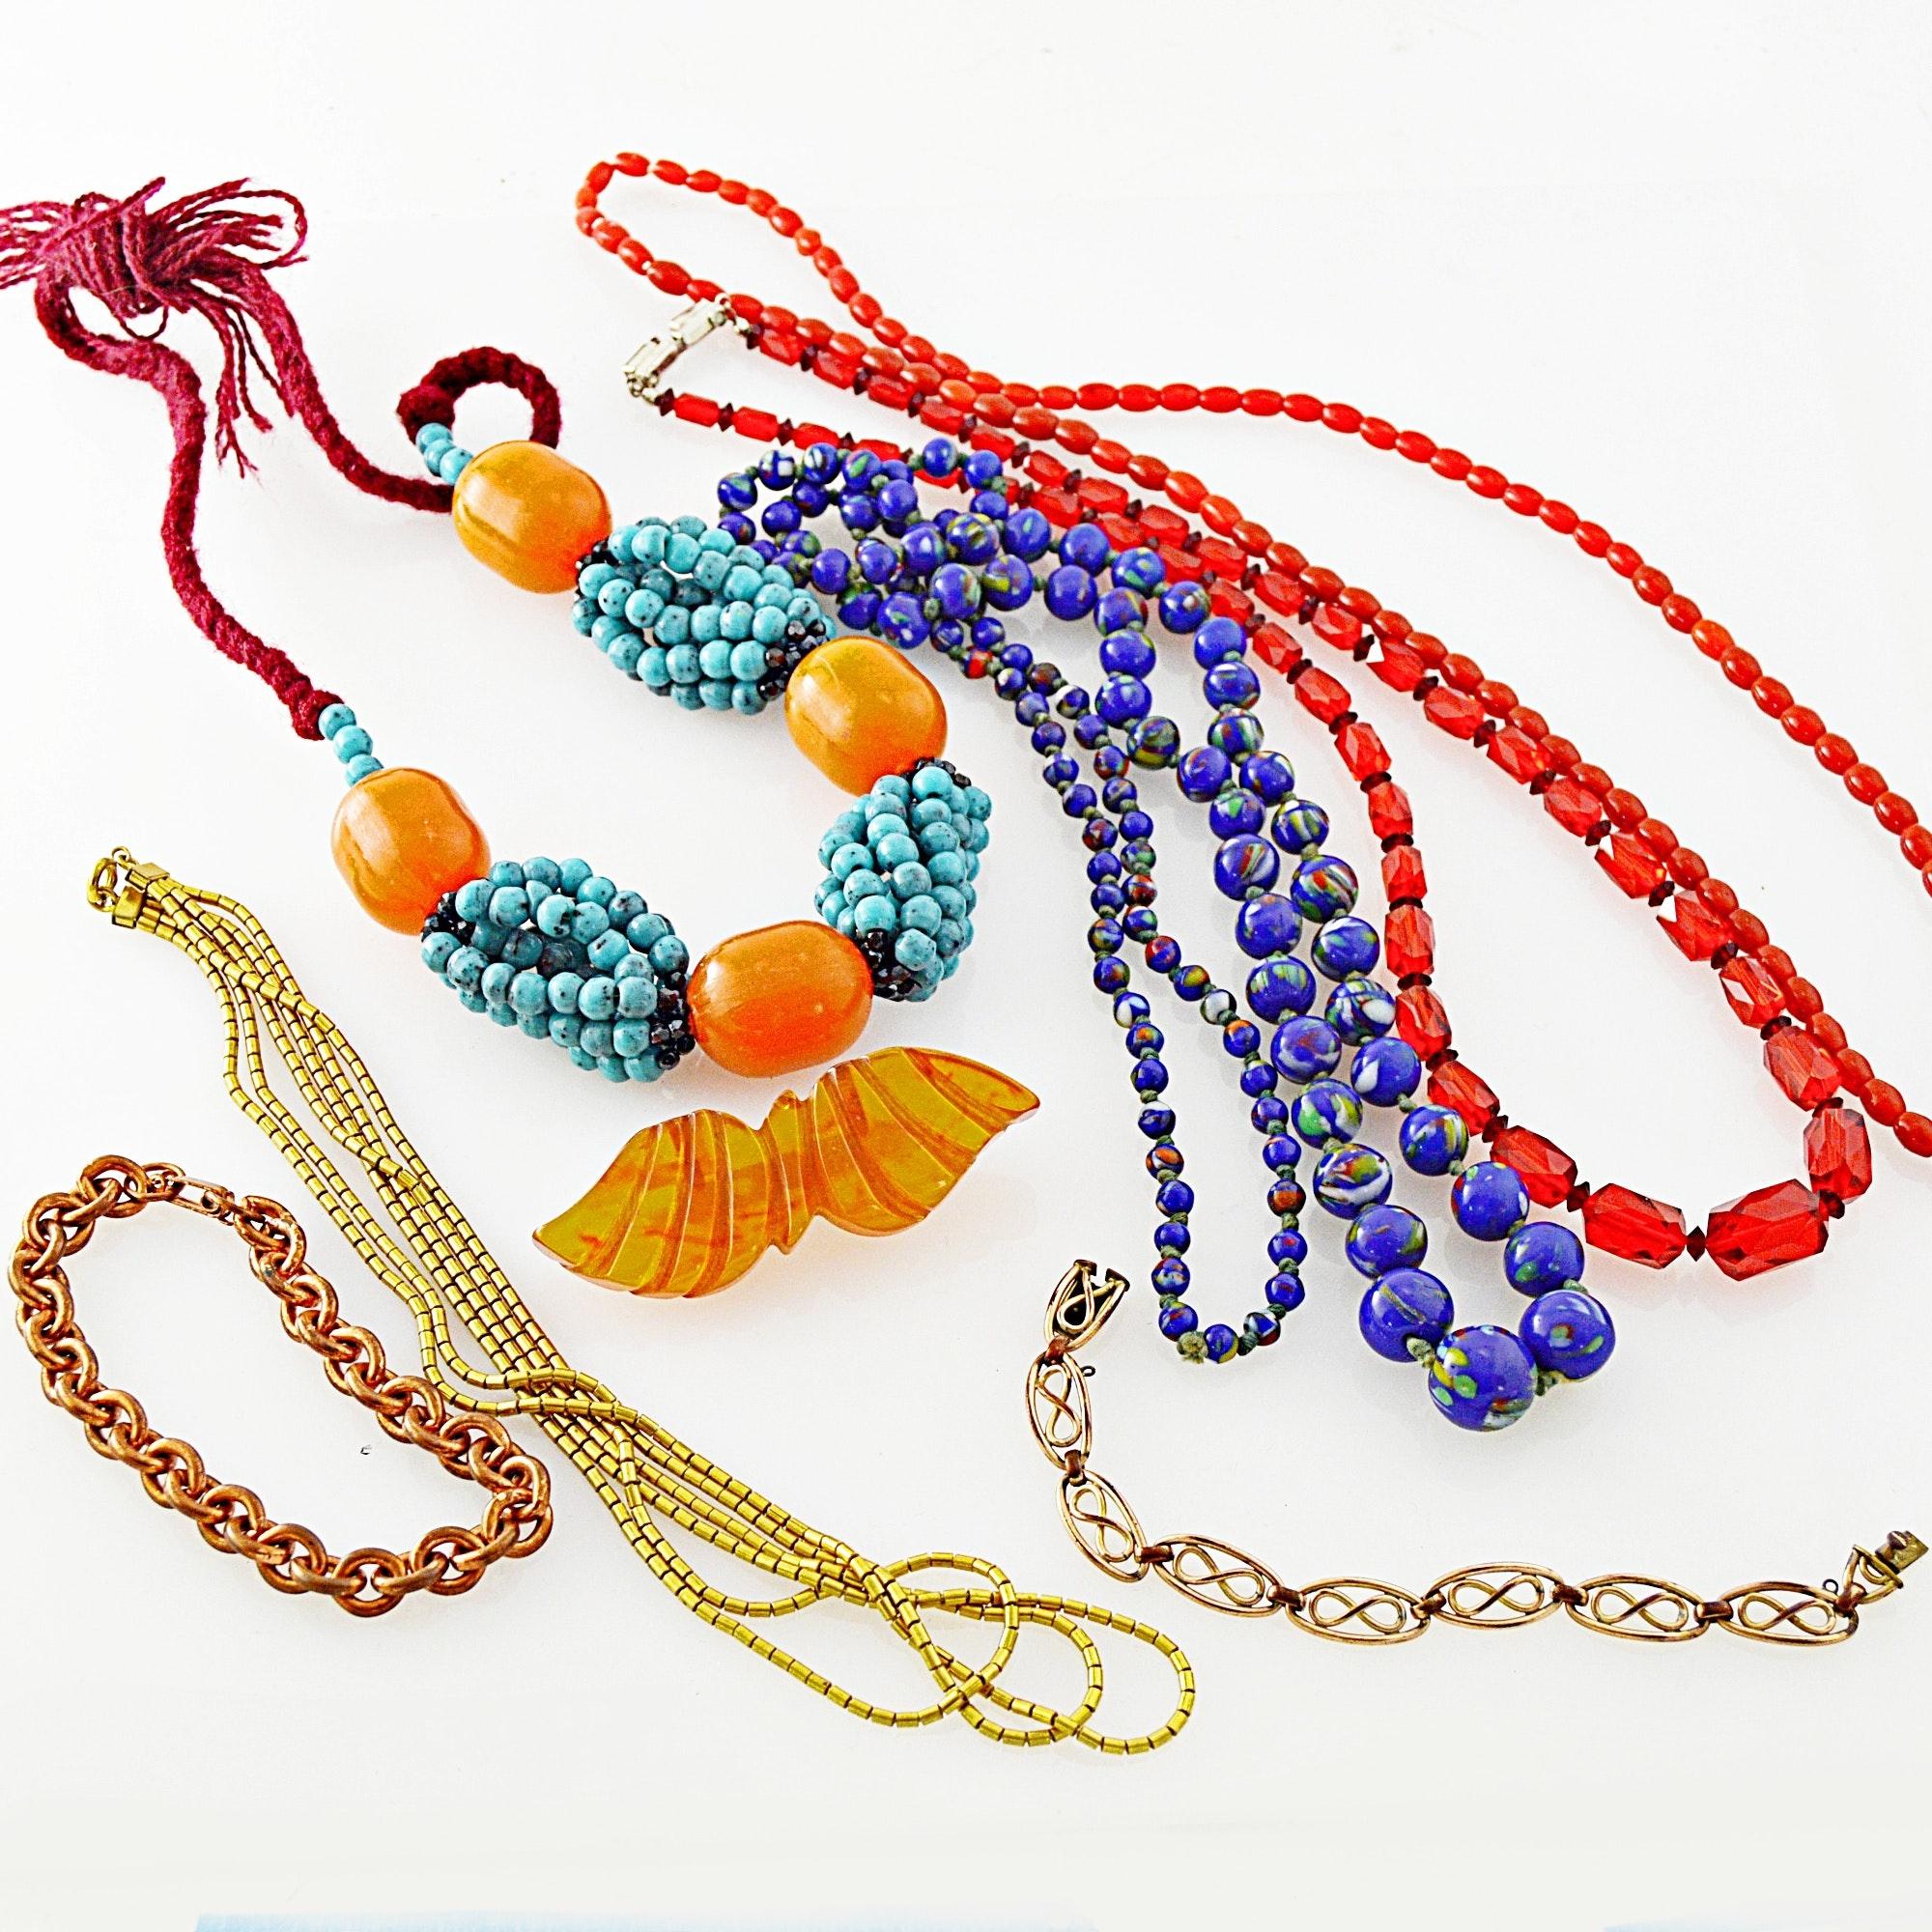 Vintage Beaded Necklaces, Art Deco Bakelite Brooch